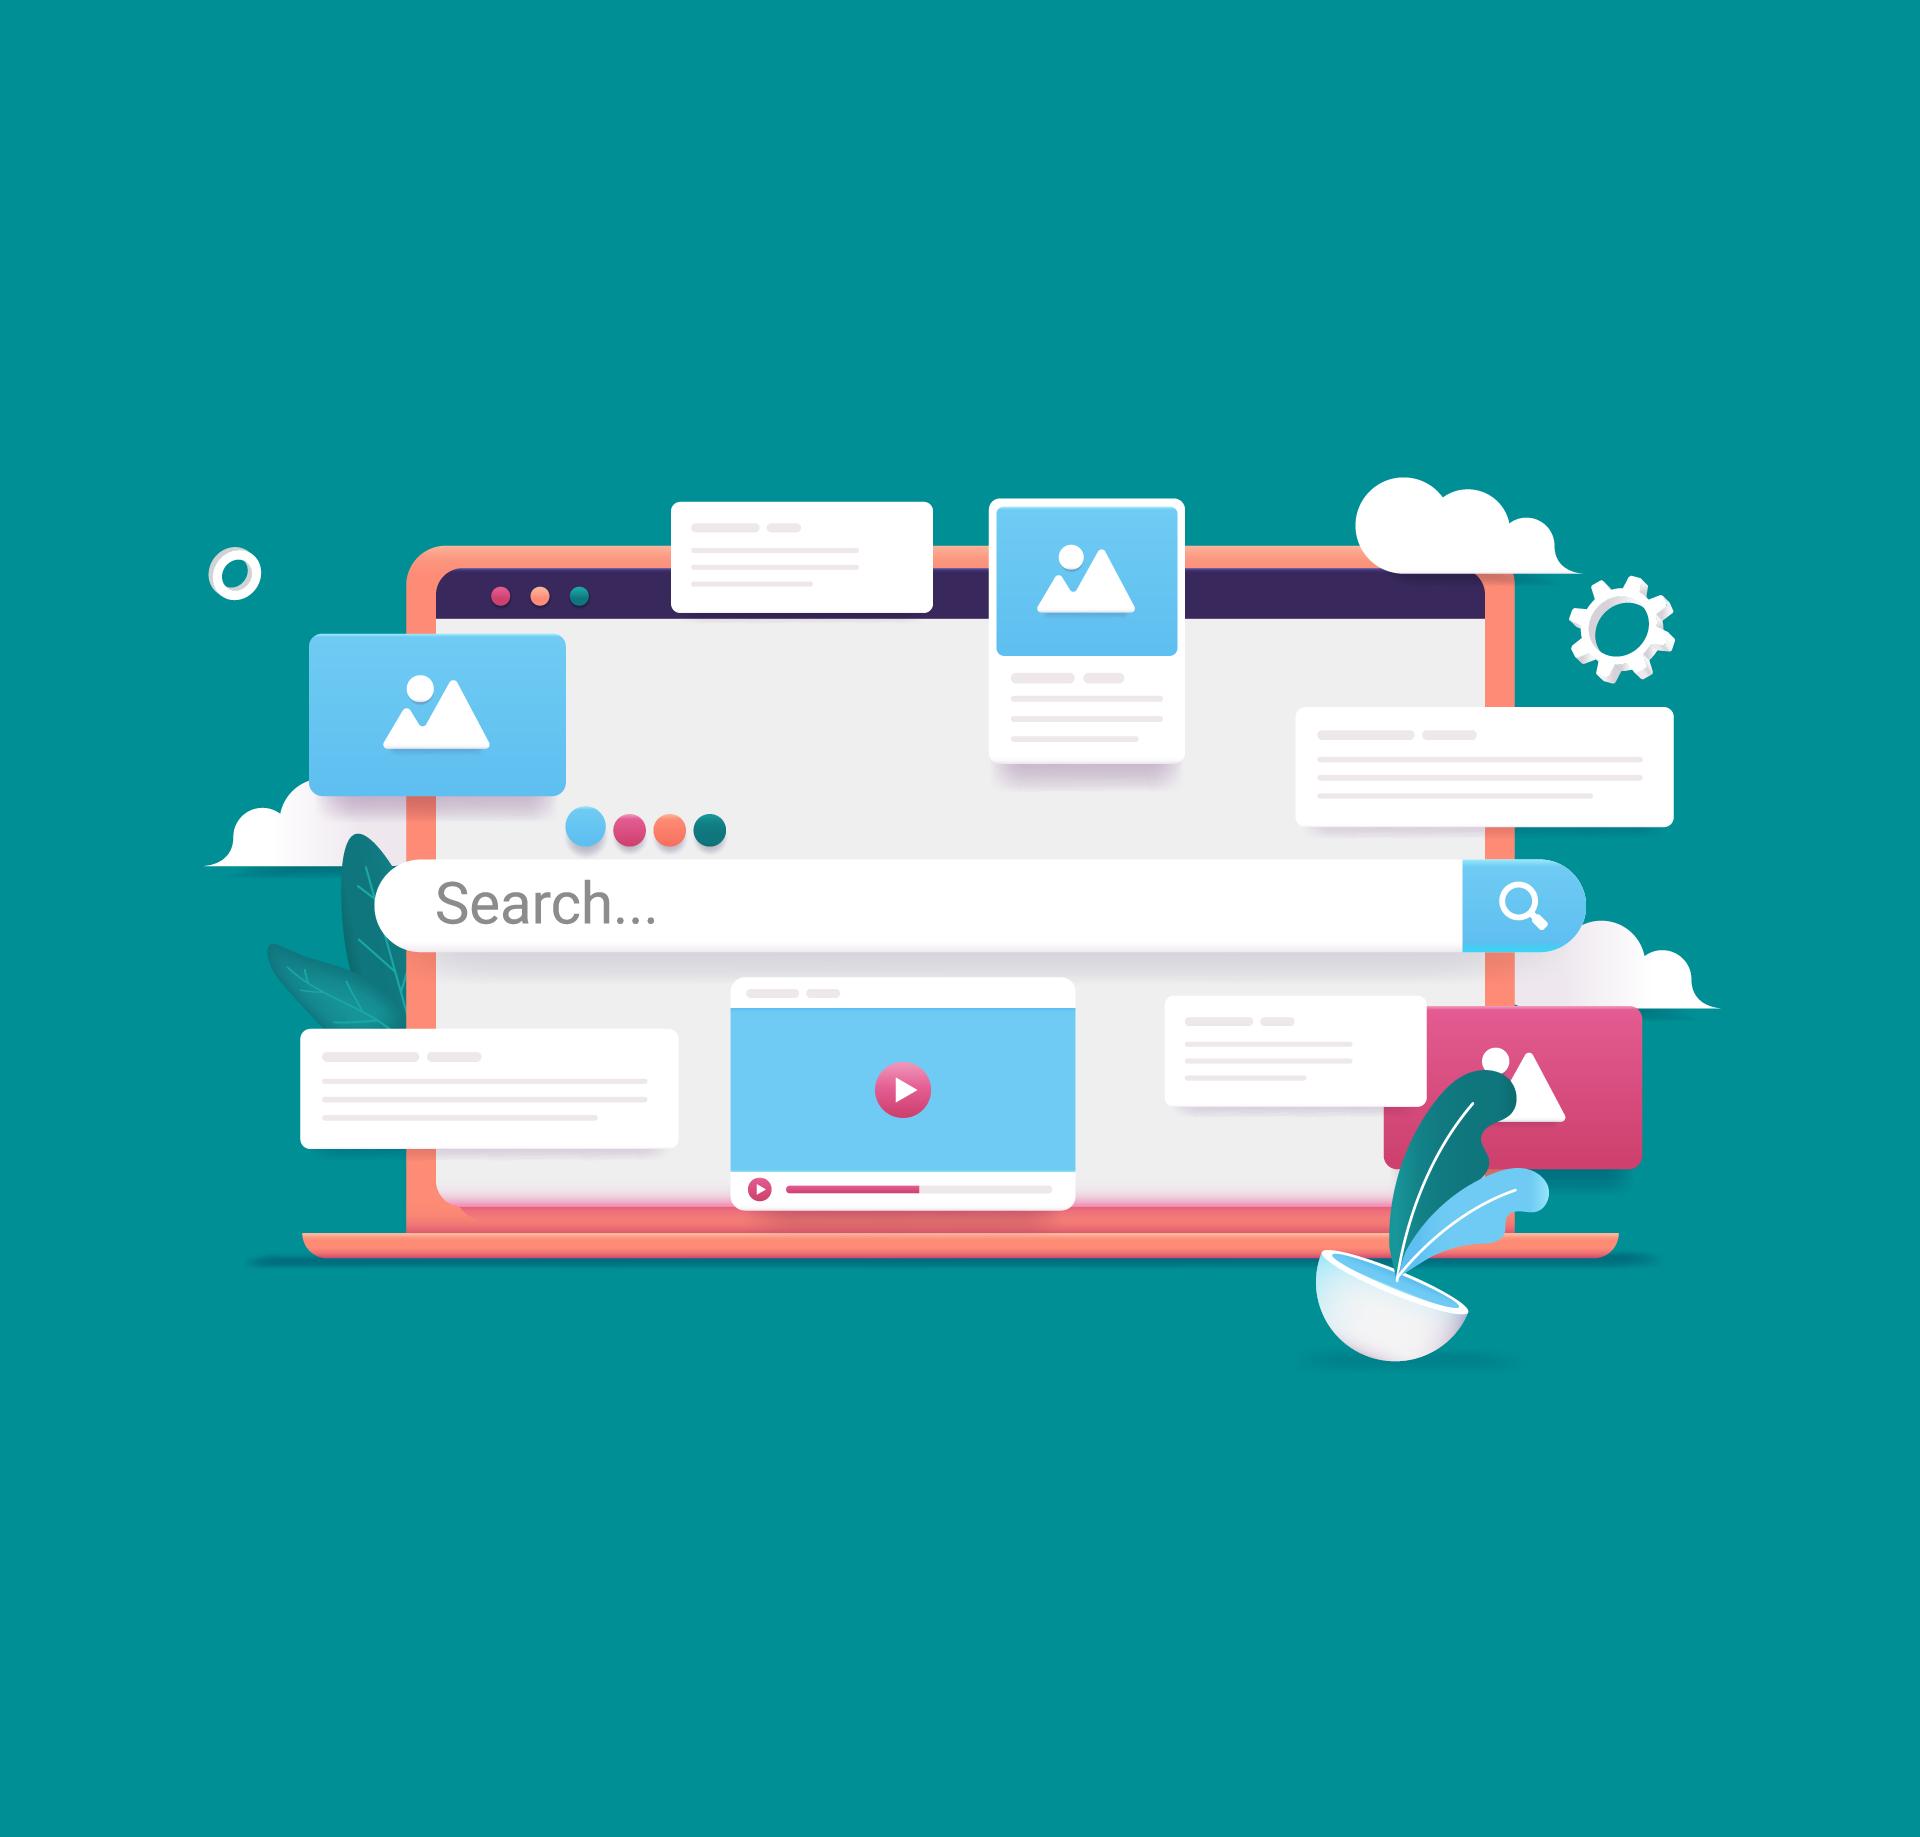 5 key ways that SEO & web design go hand in hand